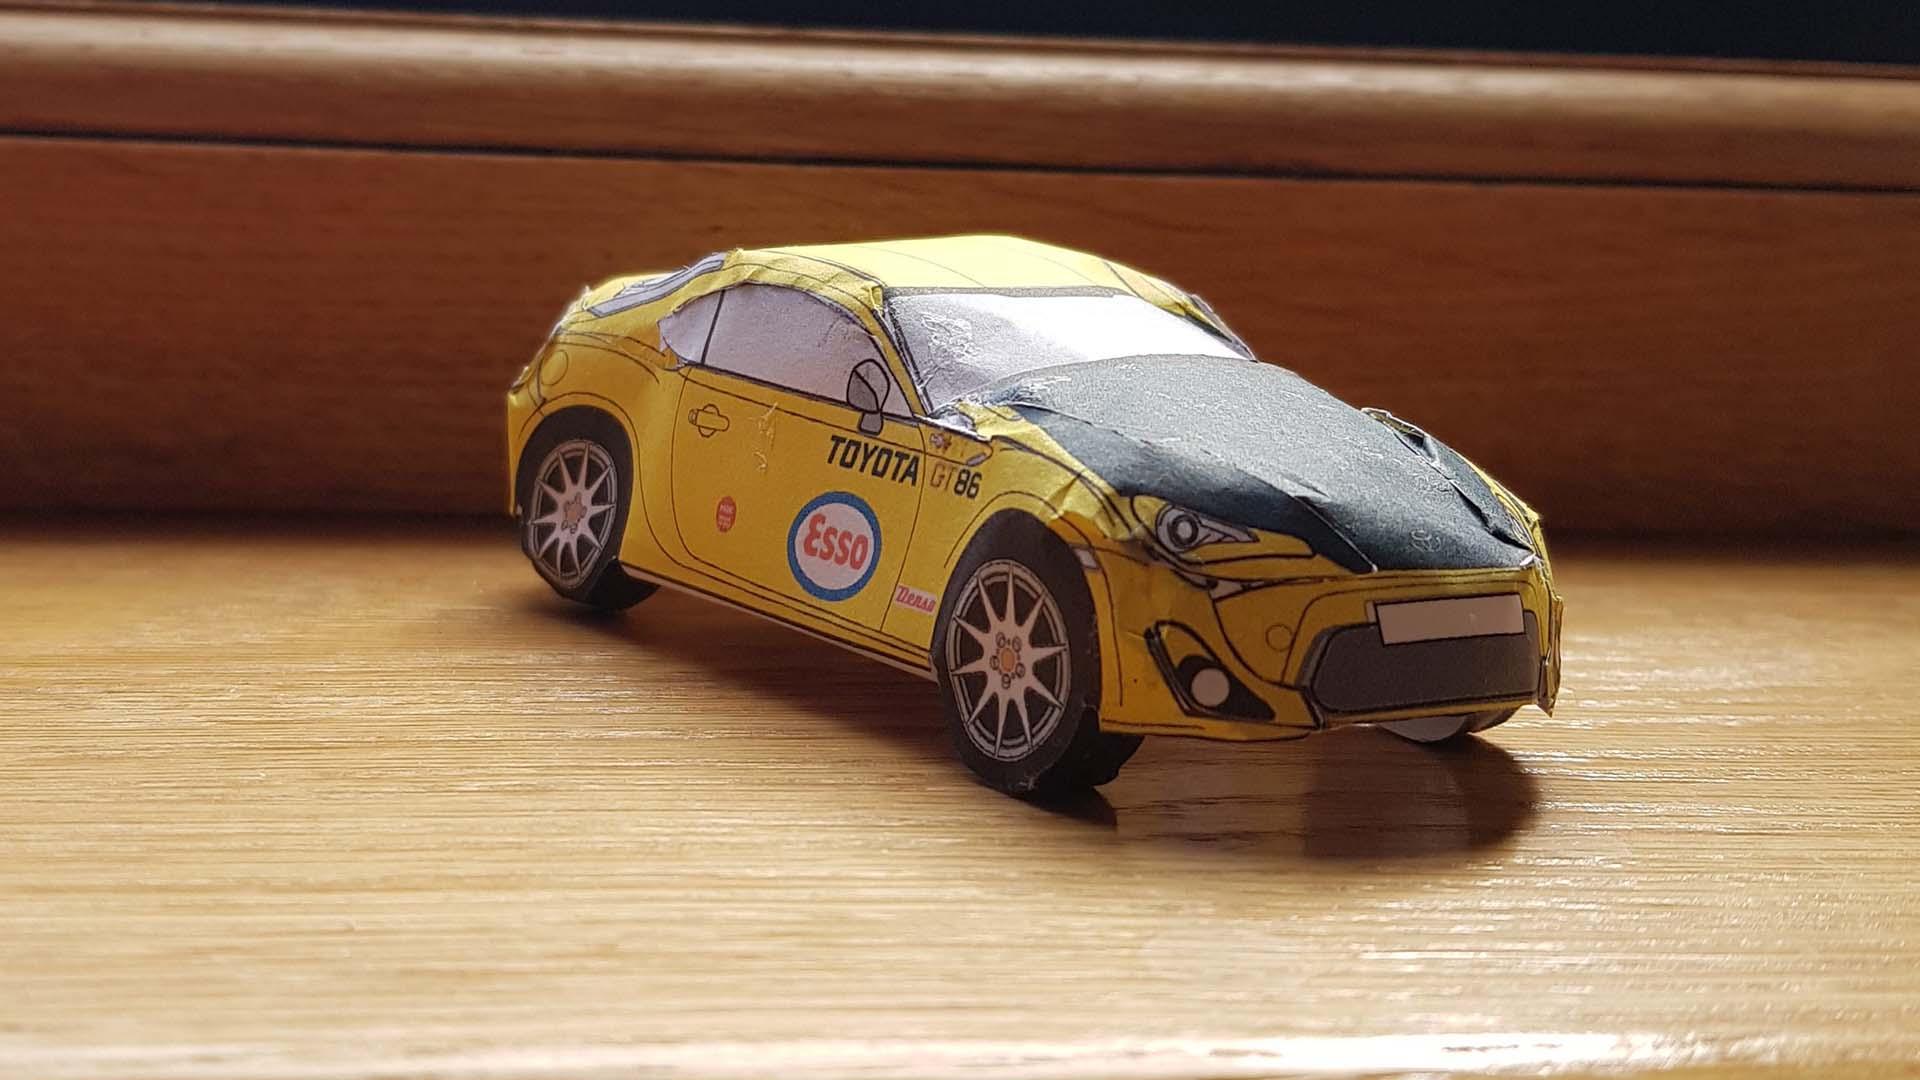 Toyota GT86 model